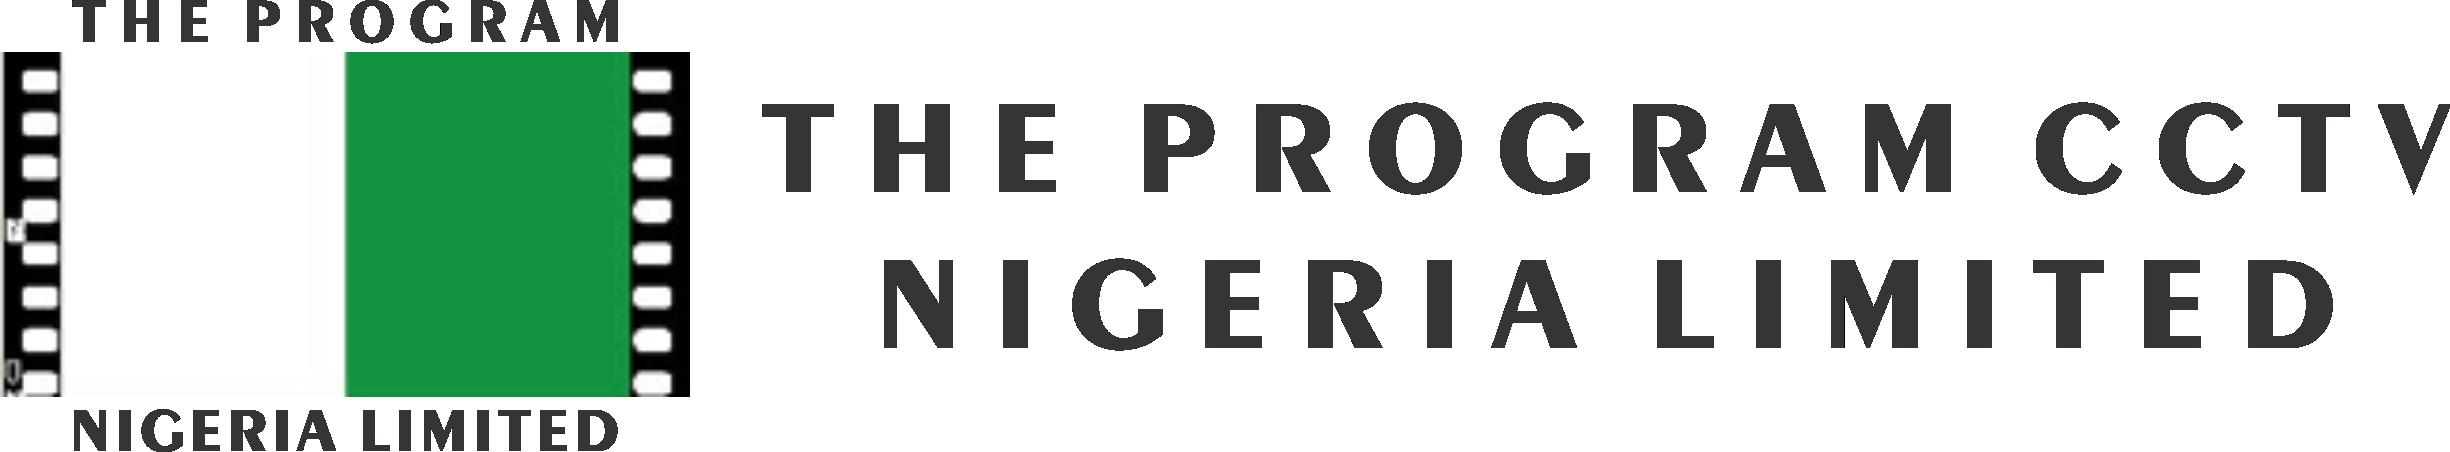 TheProgramCCTV